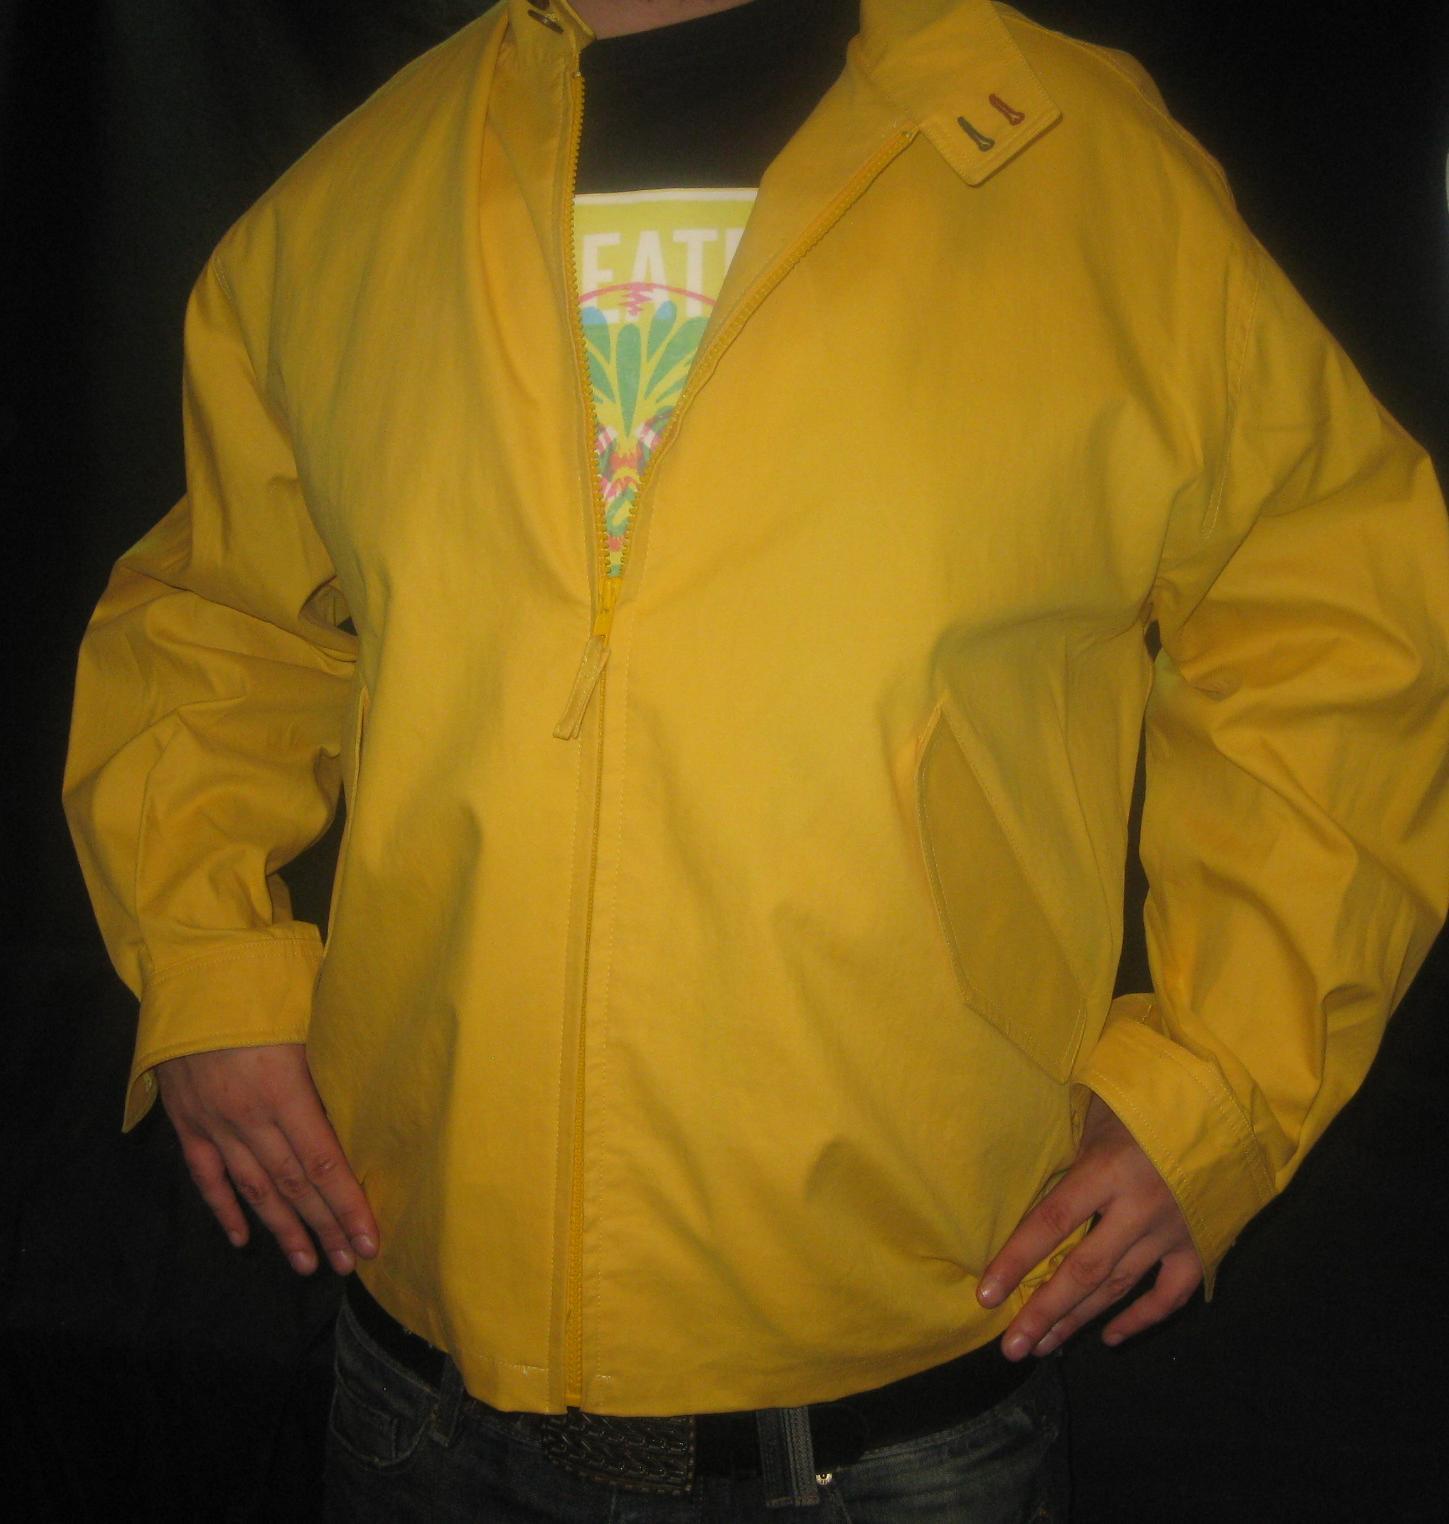 Traje Chaqueta Caballero Justo Gimeno yellow size XL - Nuevo